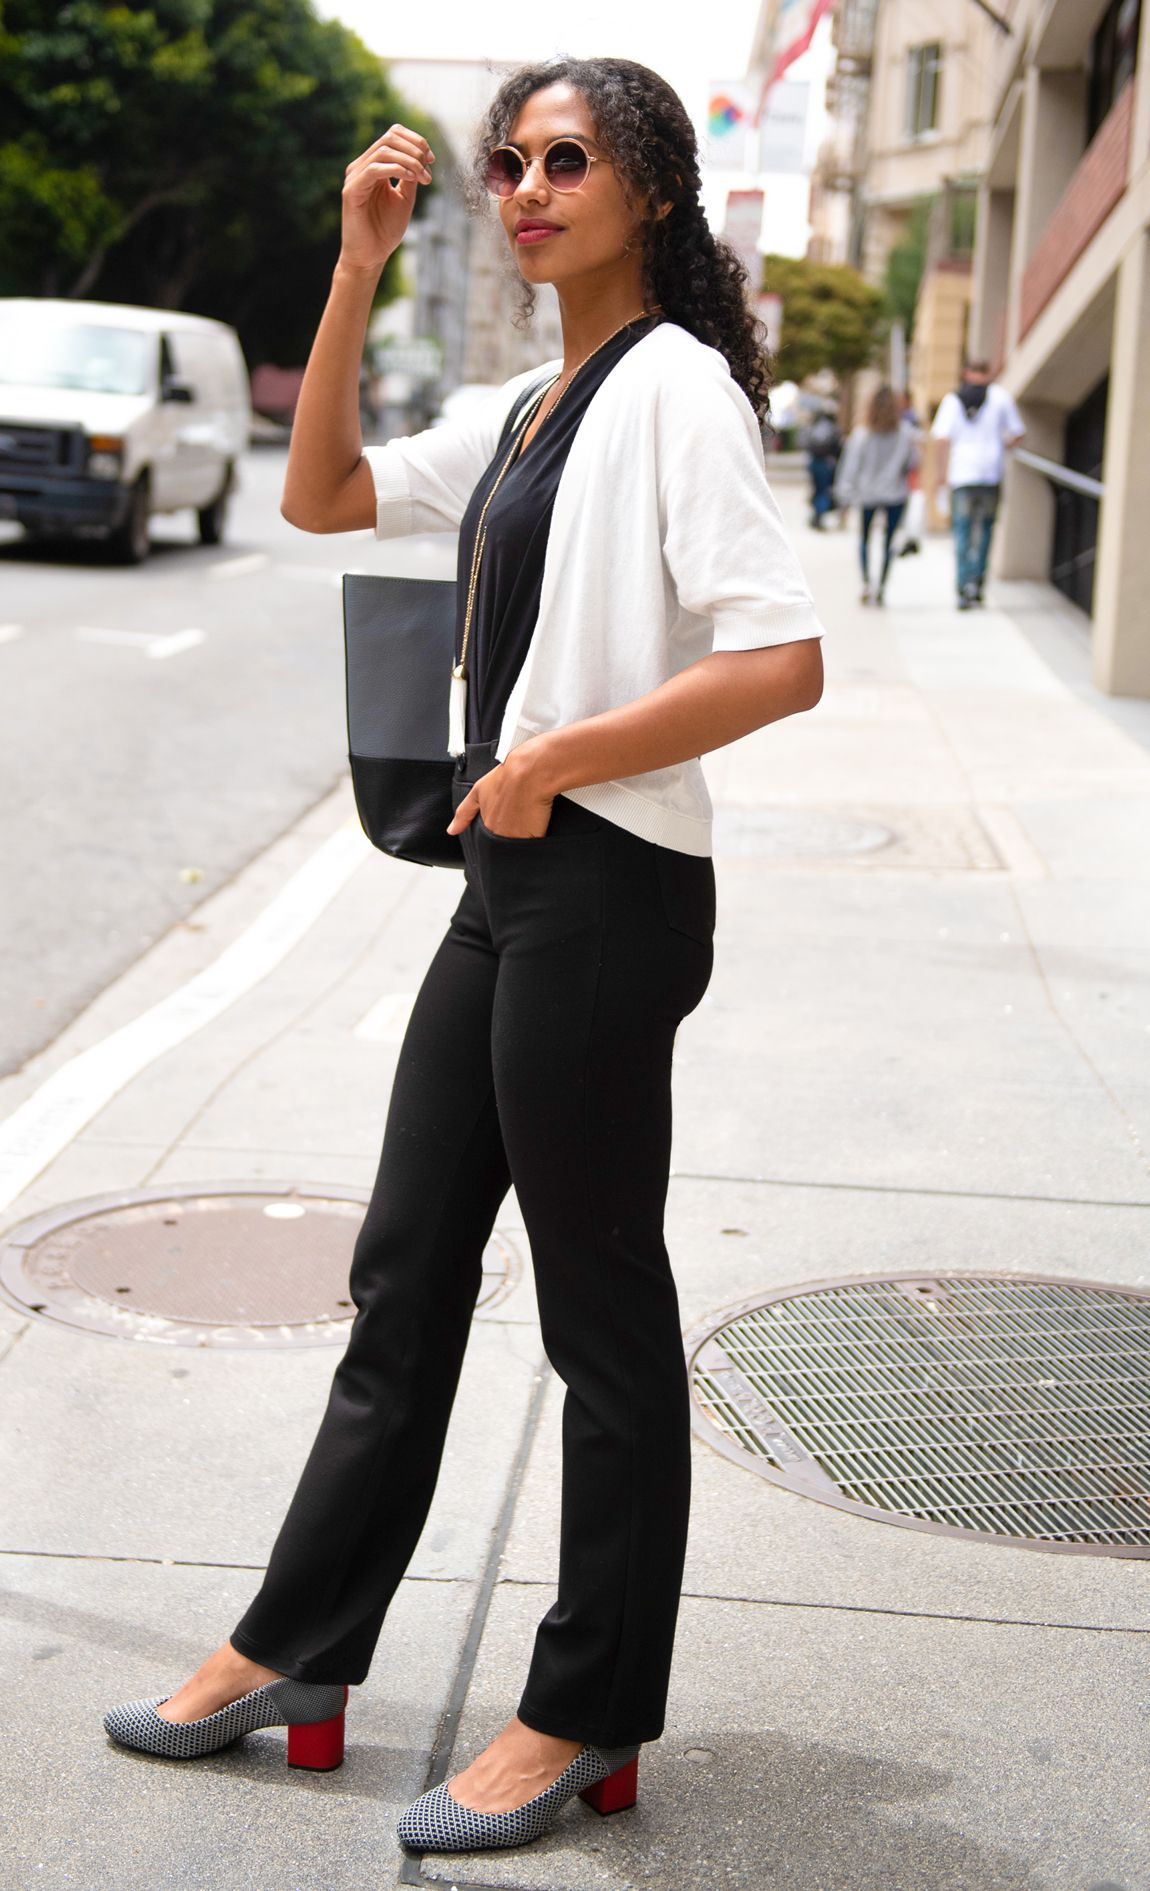 5f0d780b533e9 Boot-Cut | Jean-Style Dress Pant Yoga Pants | Wrinkle-Resistant, 4 ...